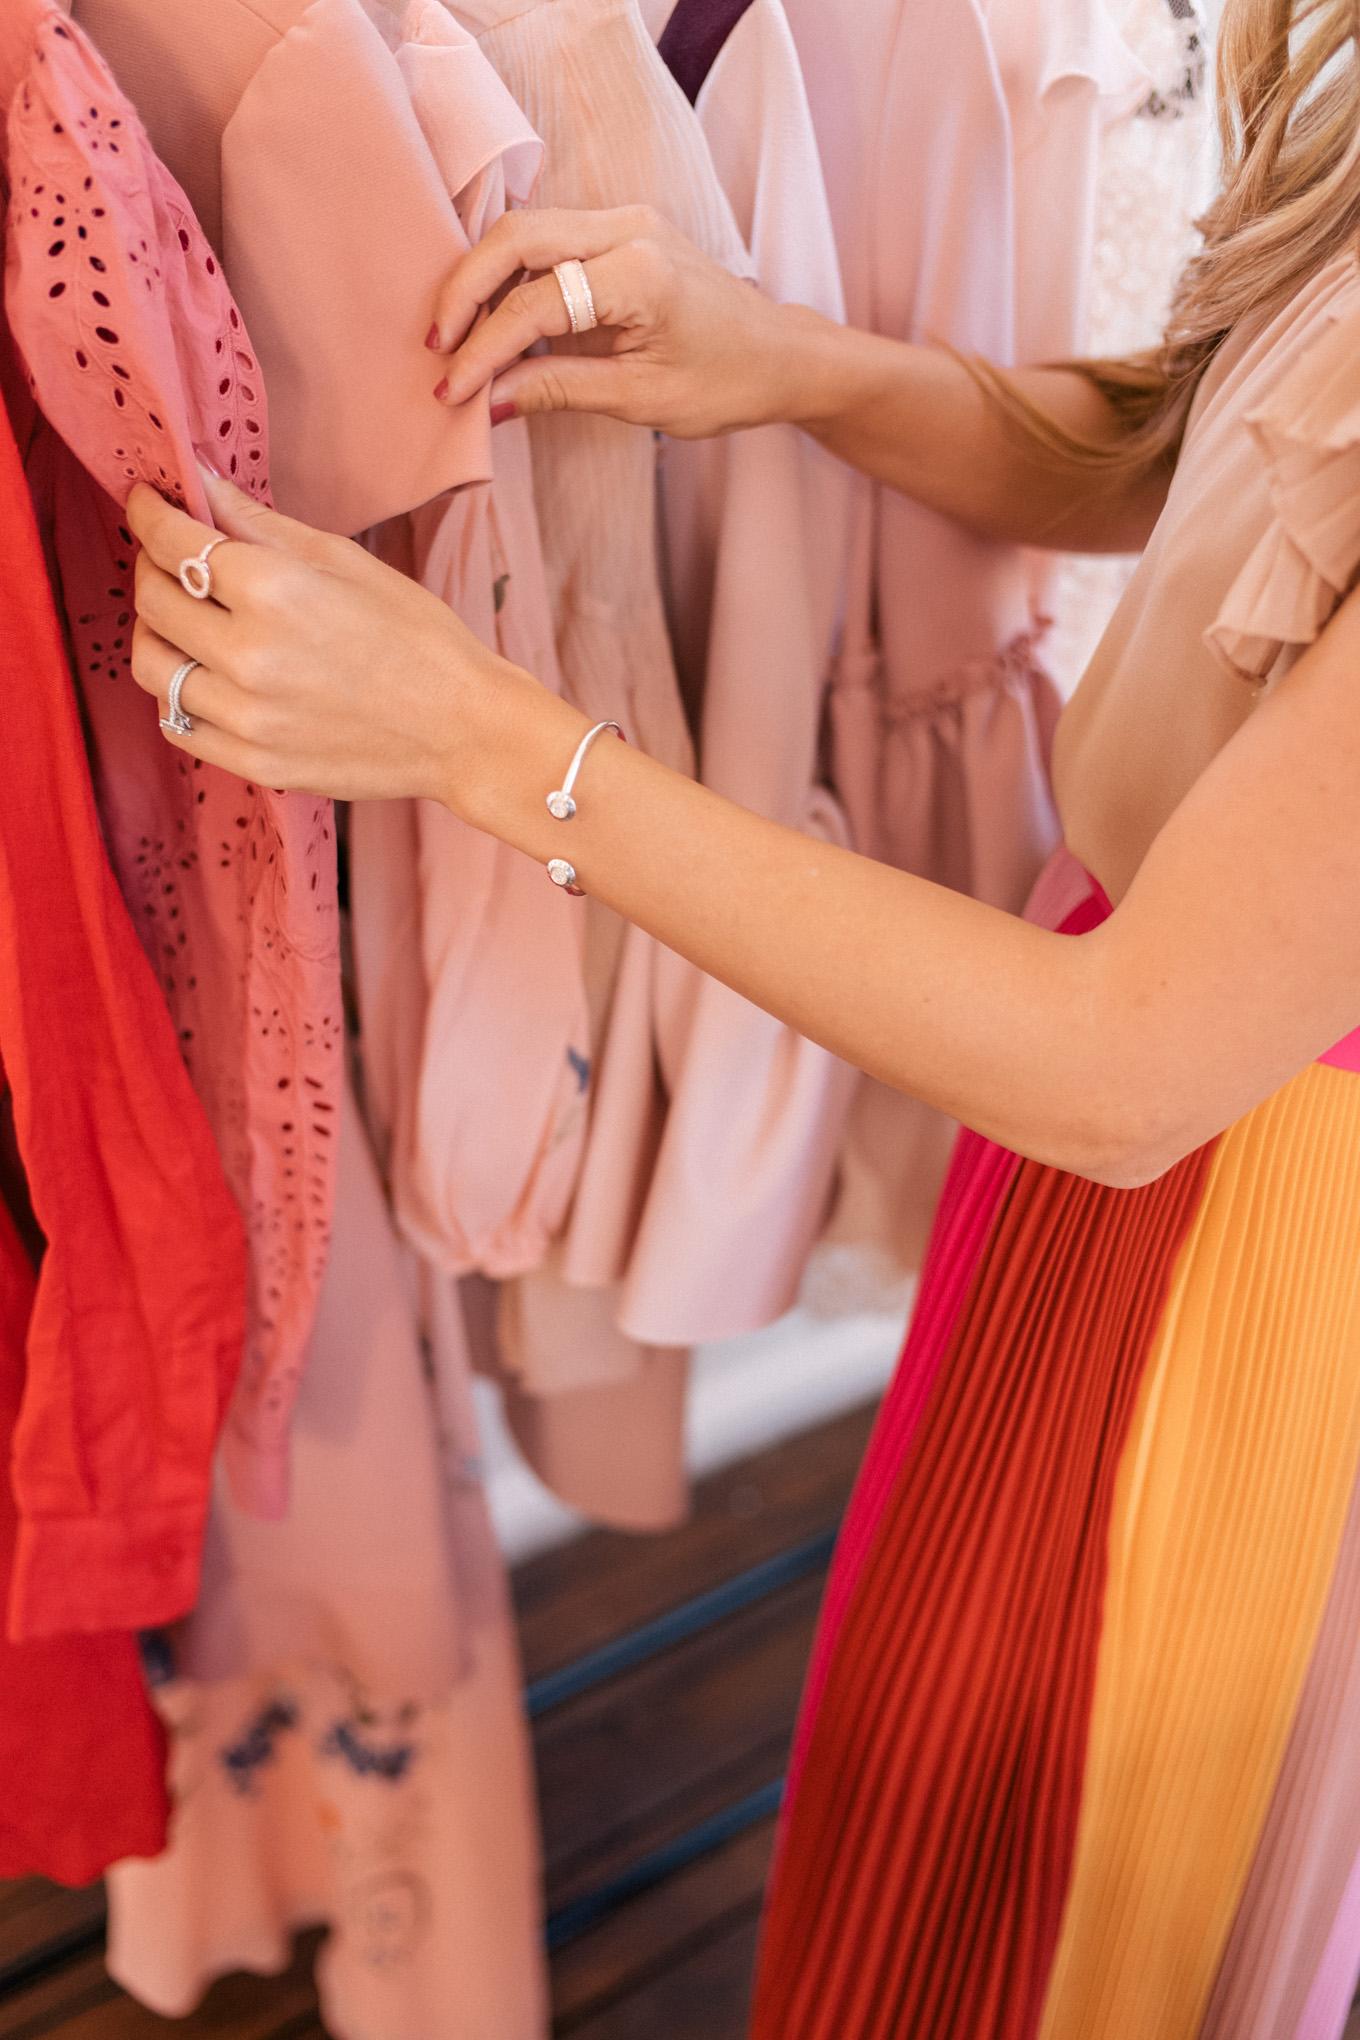 comment porter le bracelet jonc julia berolzheimer seul